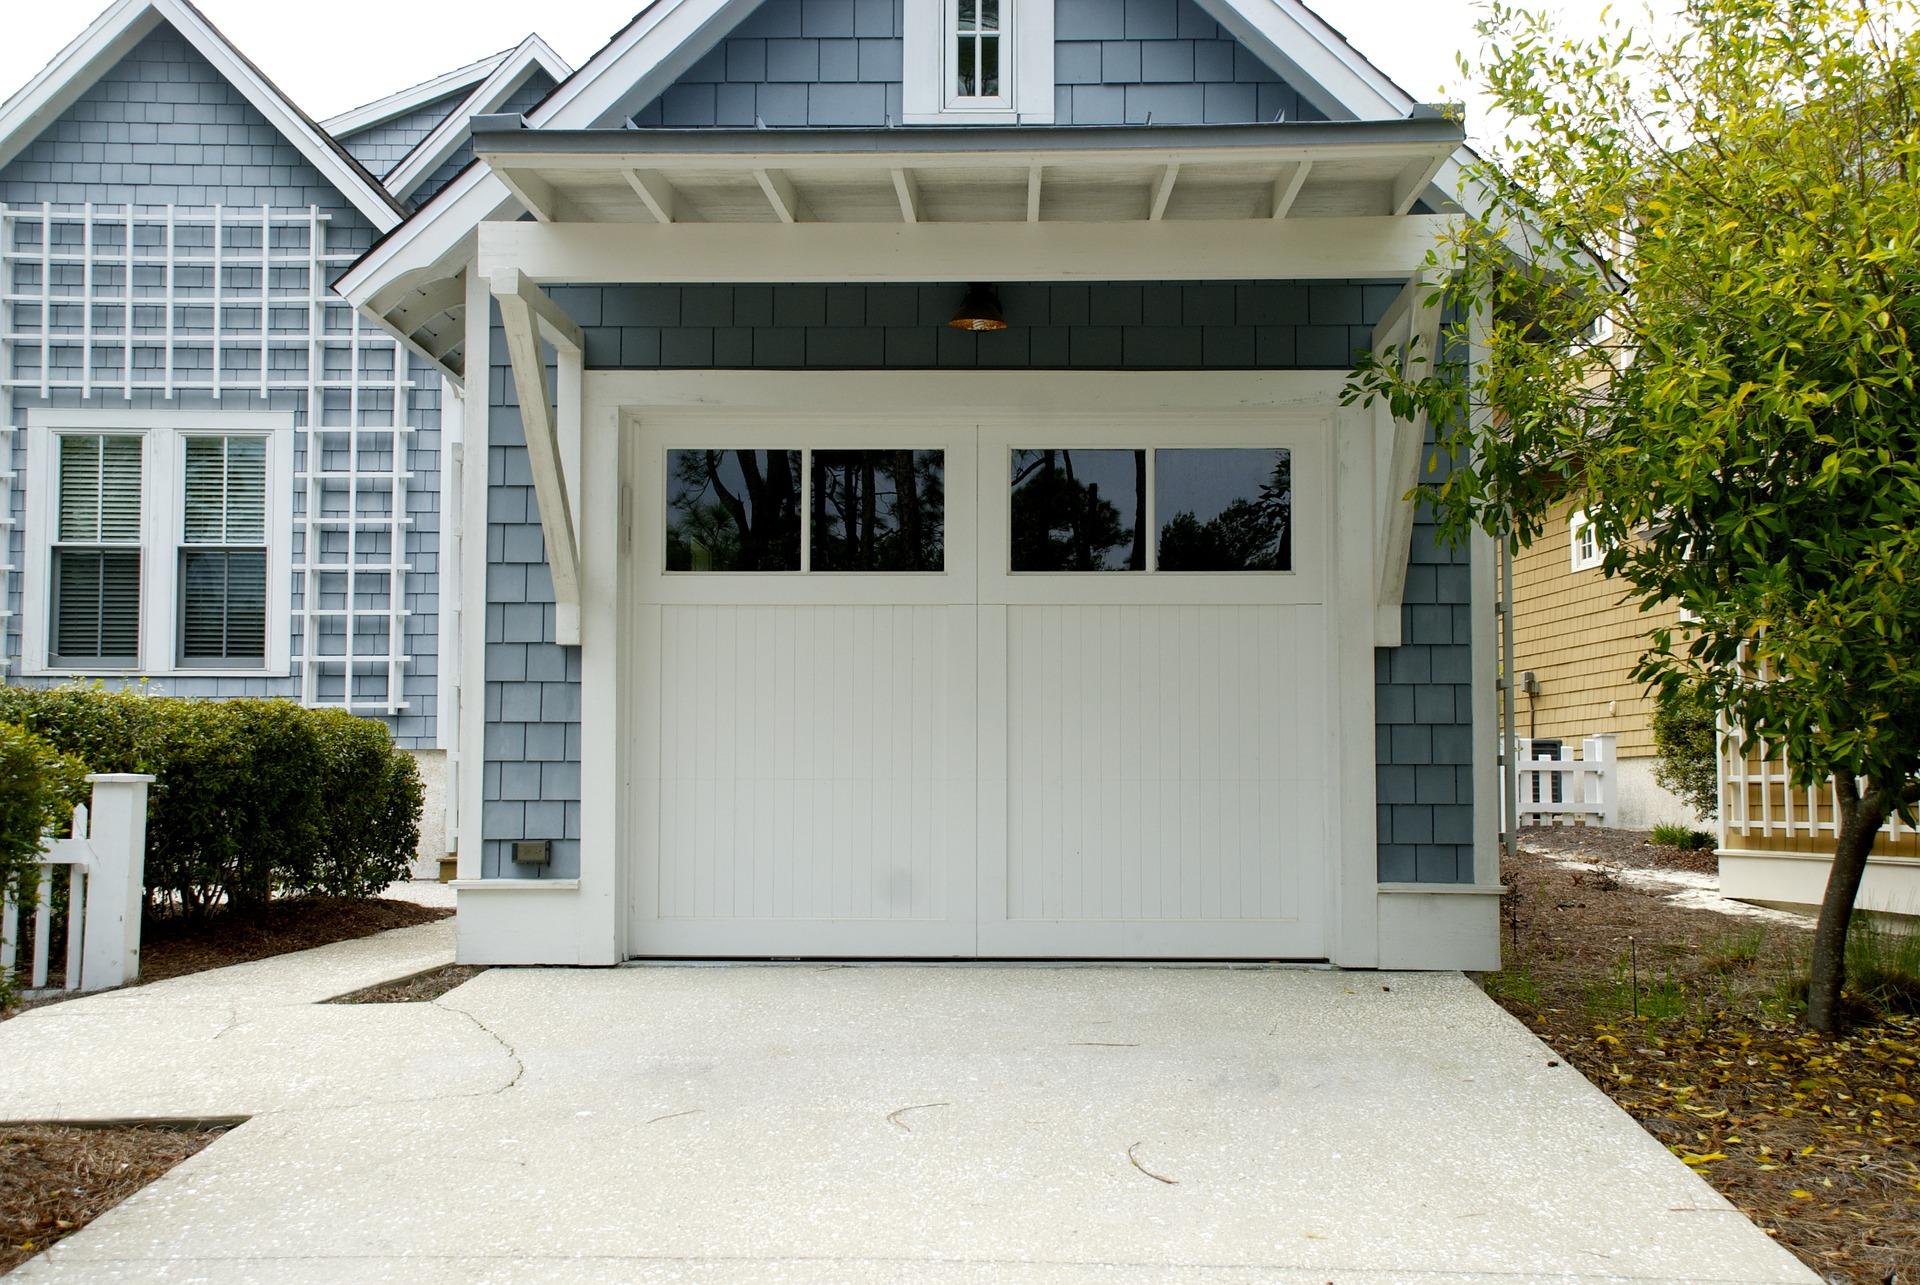 brama garaż